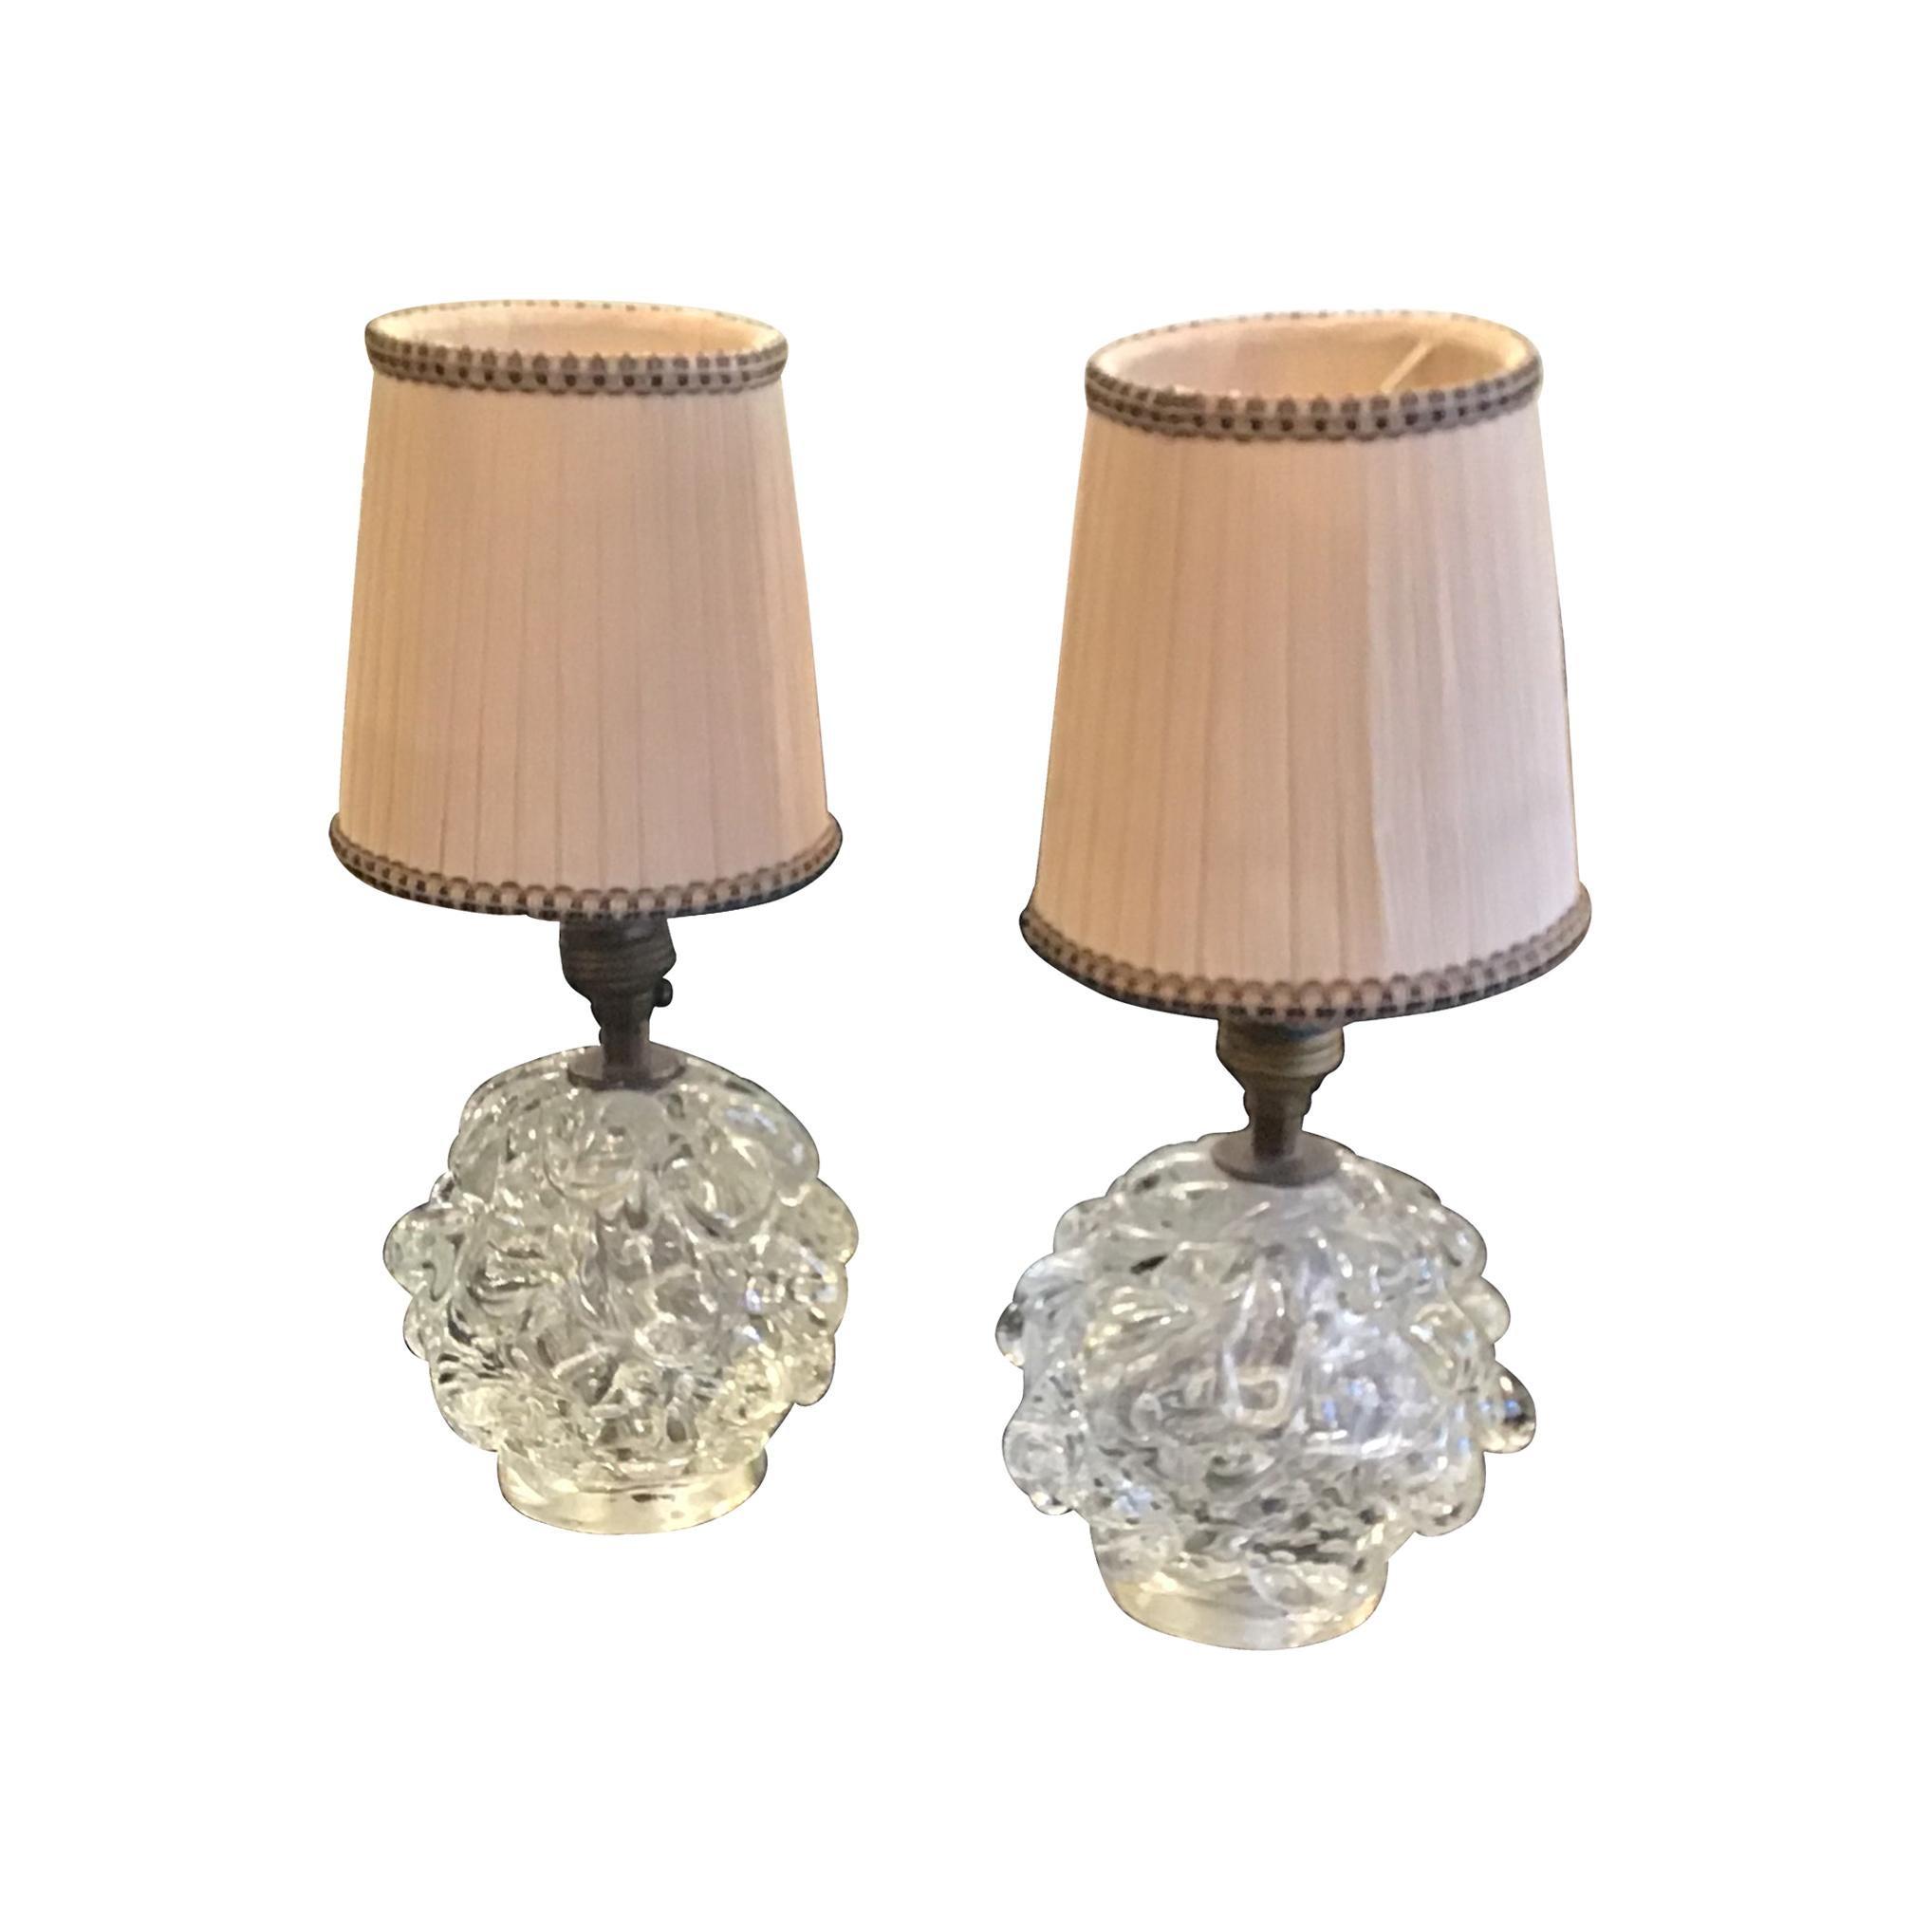 Seguso Couple Table Lamp 1940 Murano Glass Brass, Italy